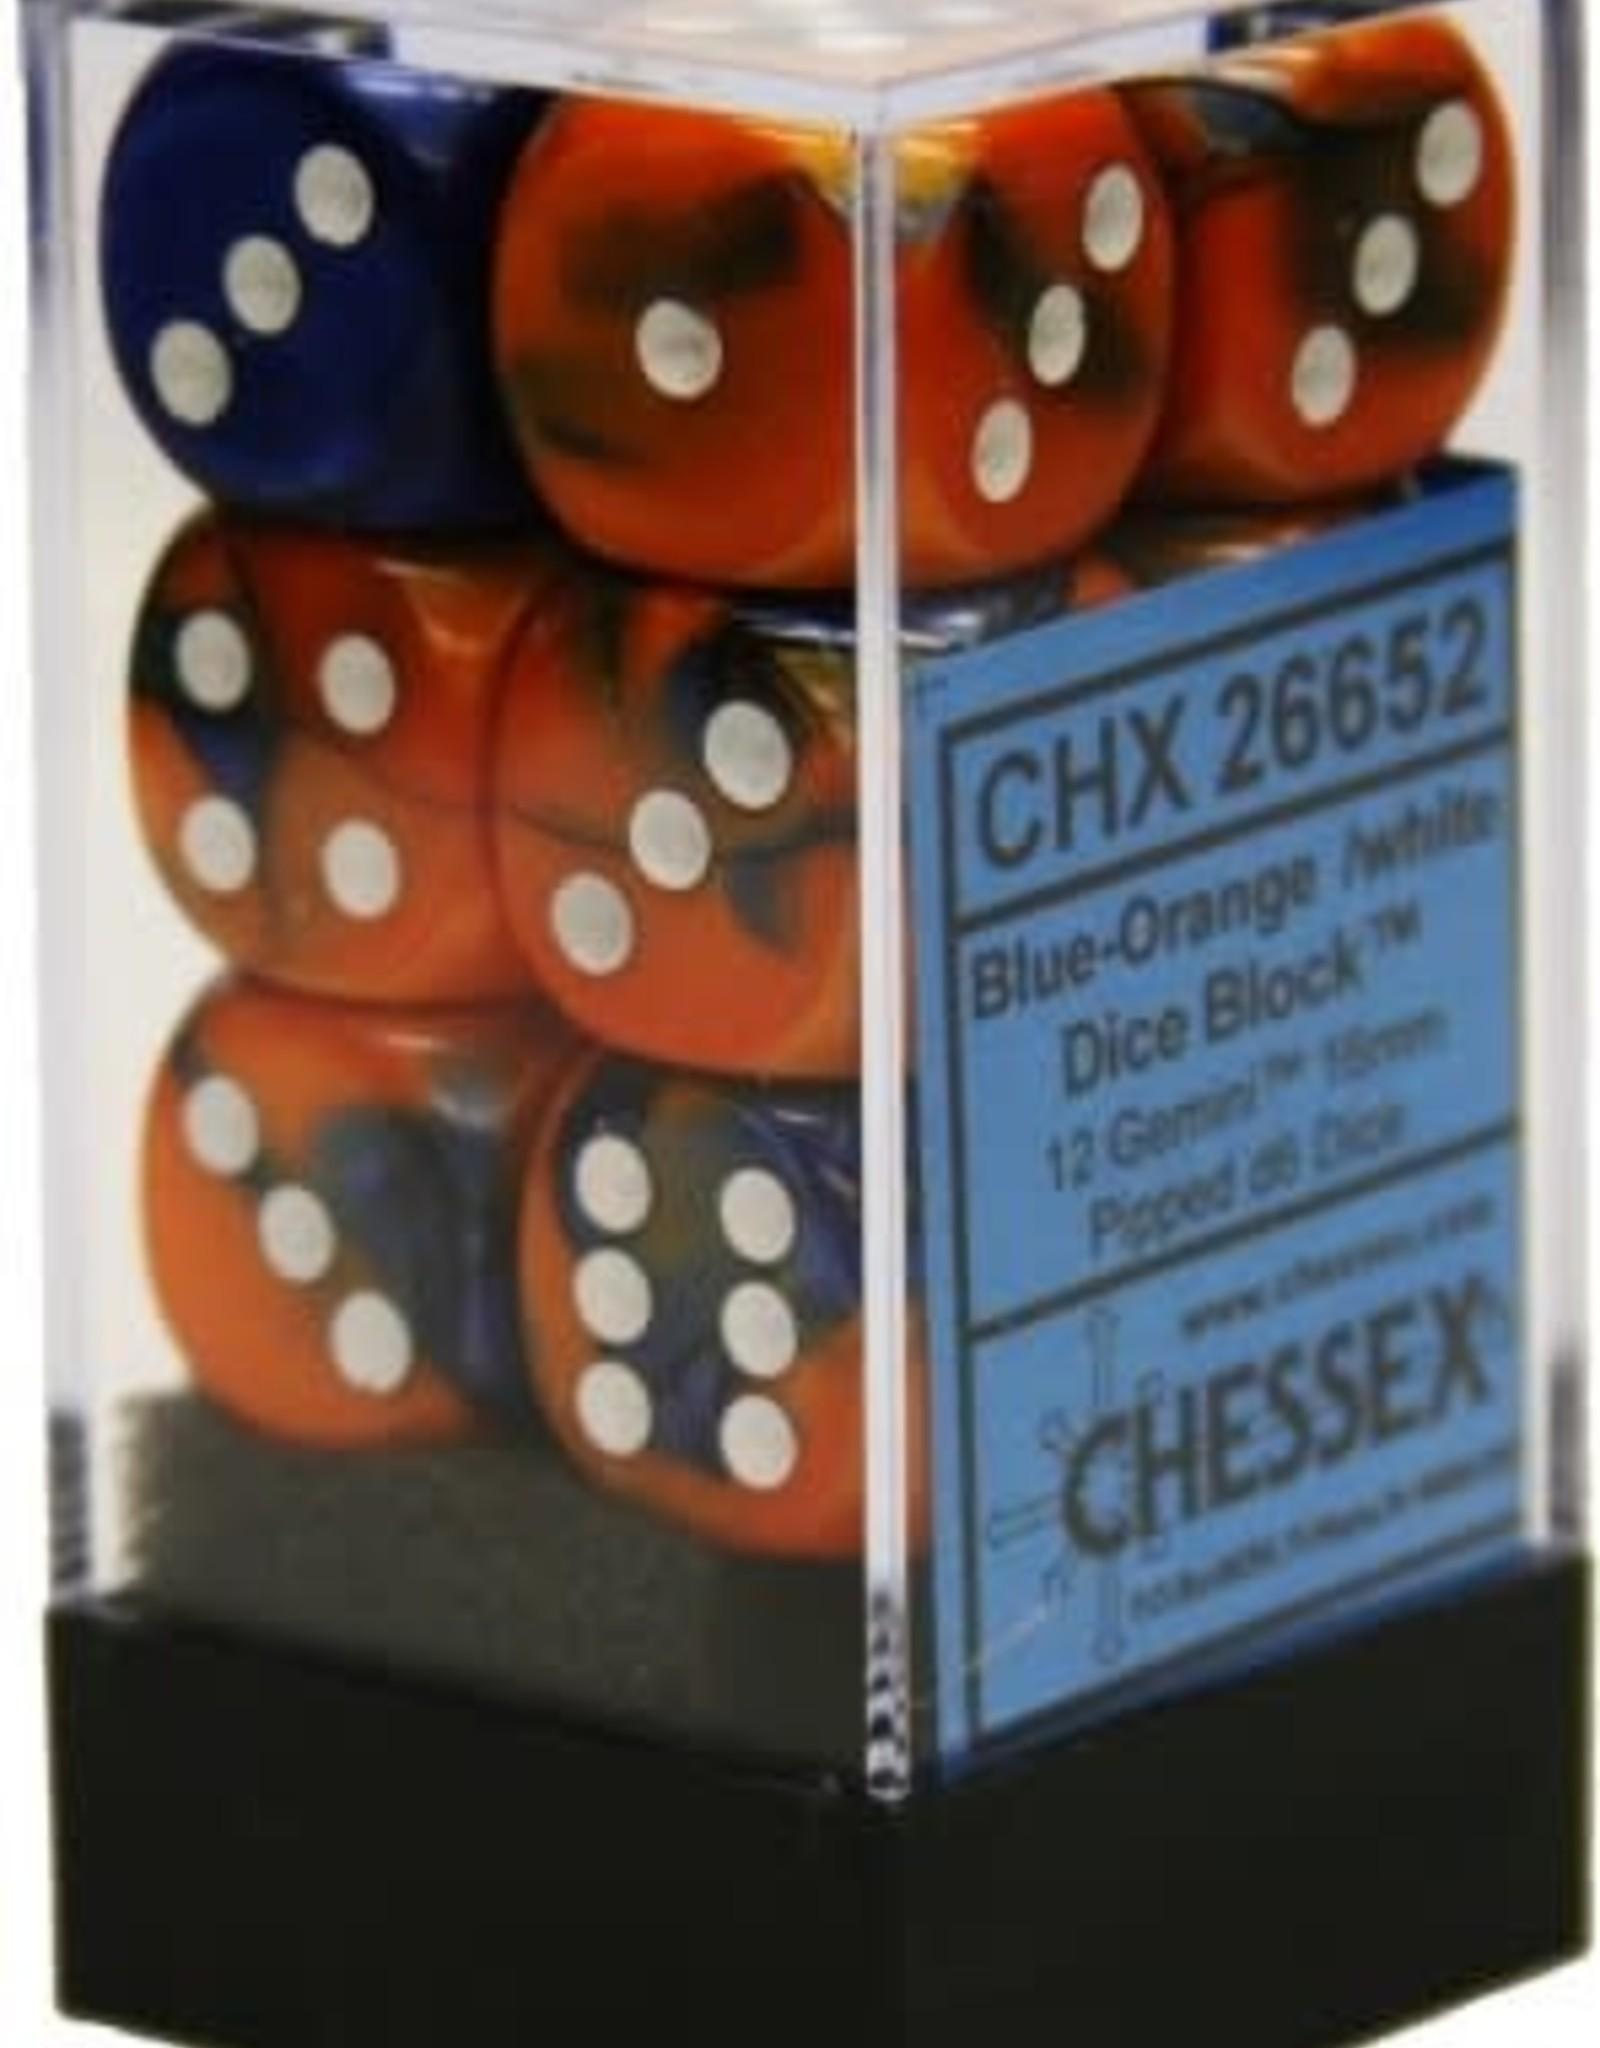 Chessex 12 Blue-Orange /white Gemini 16mm D6 - CHX26652